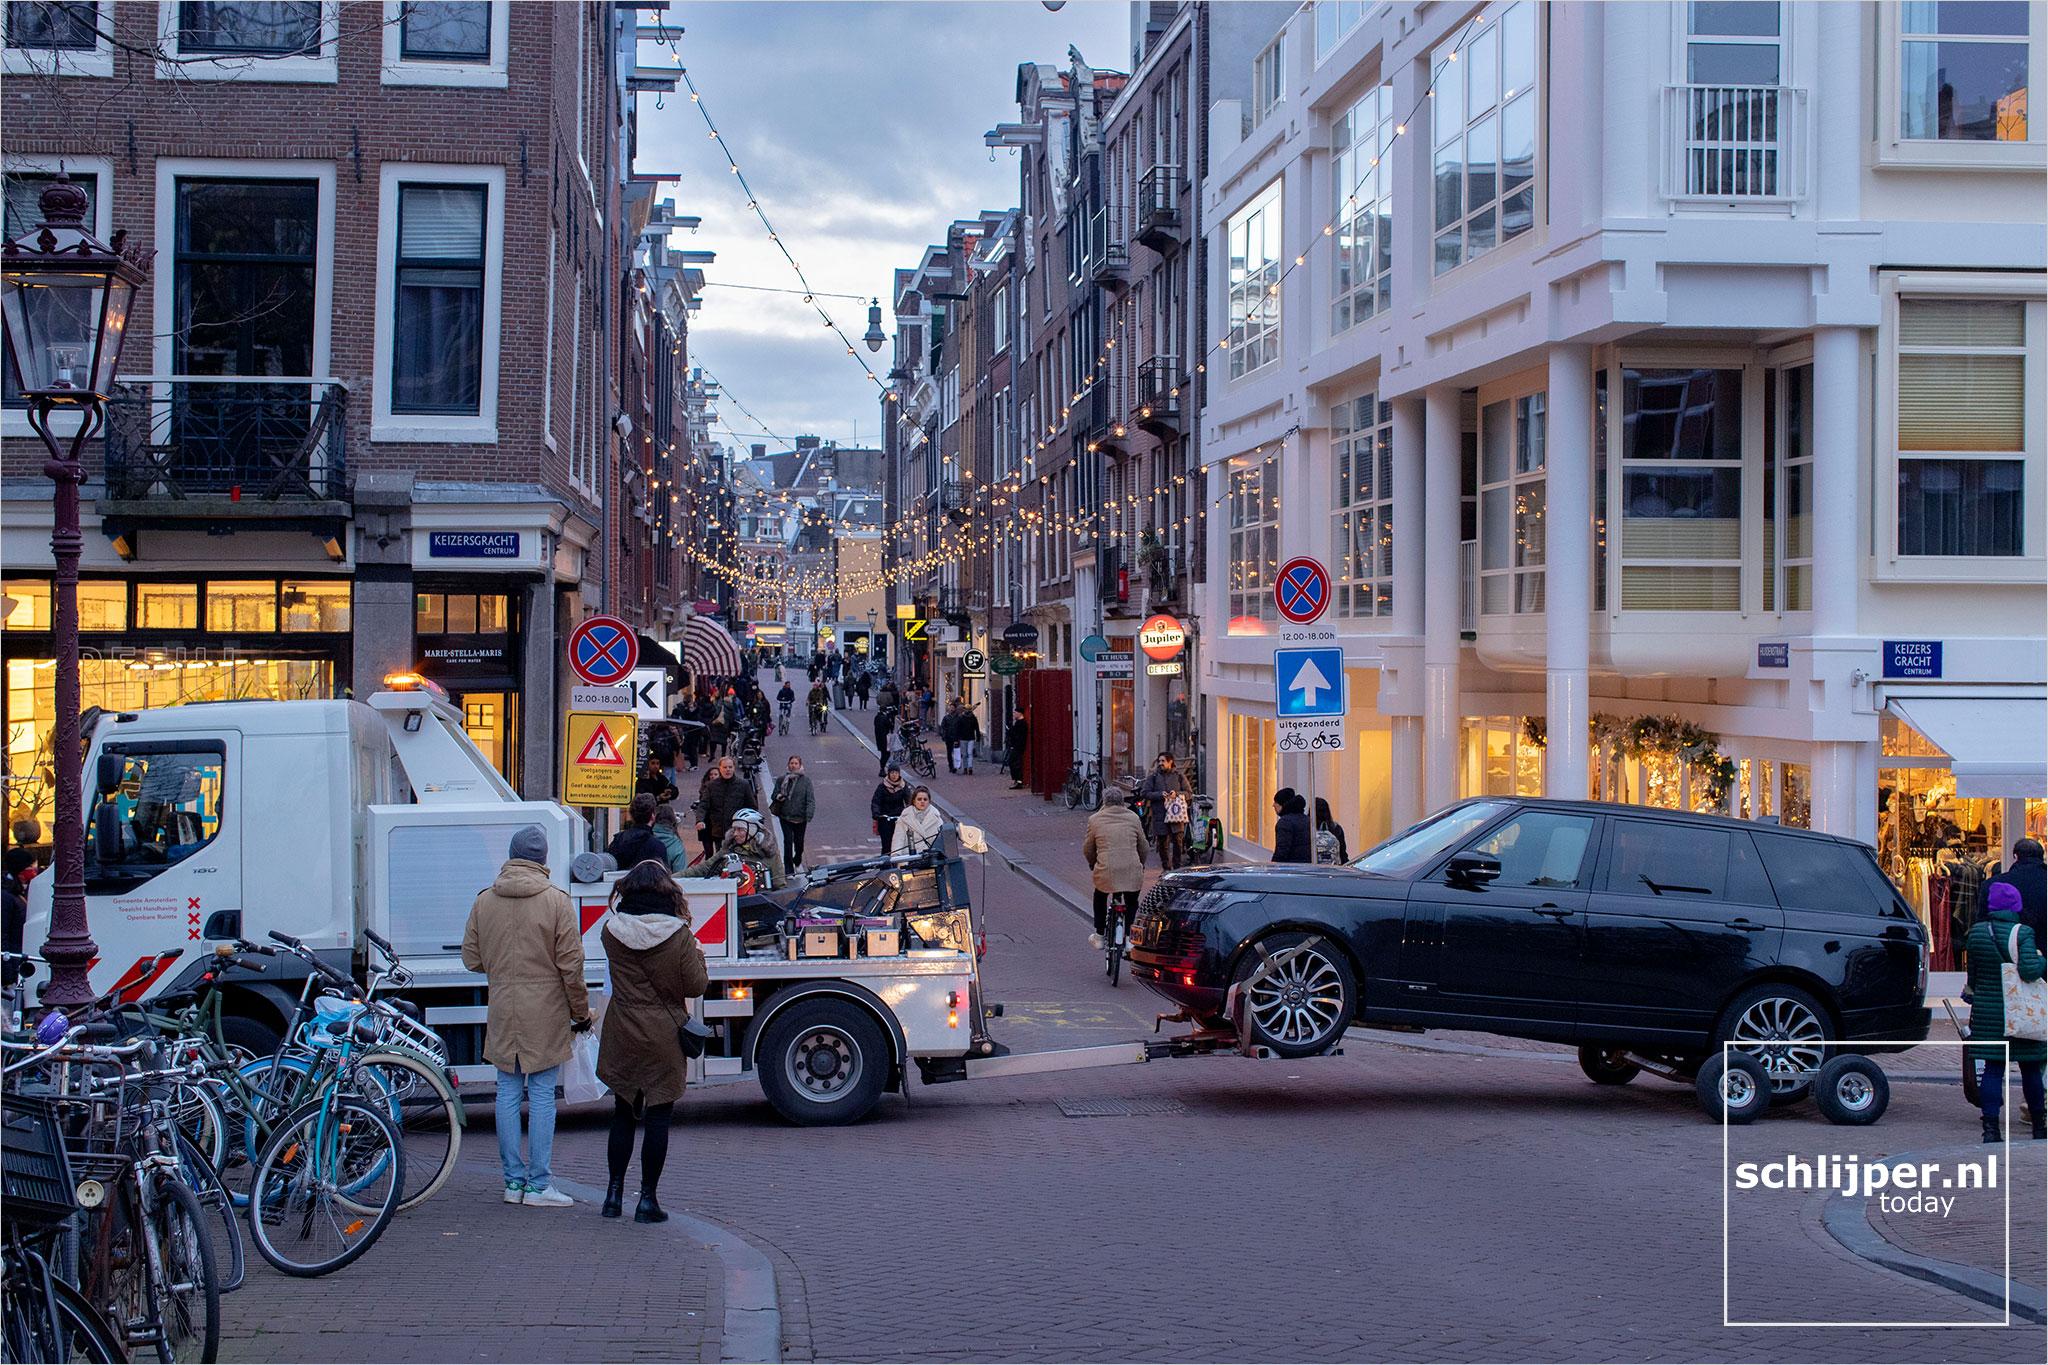 The Netherlands, Amsterdam, 5 december 2020